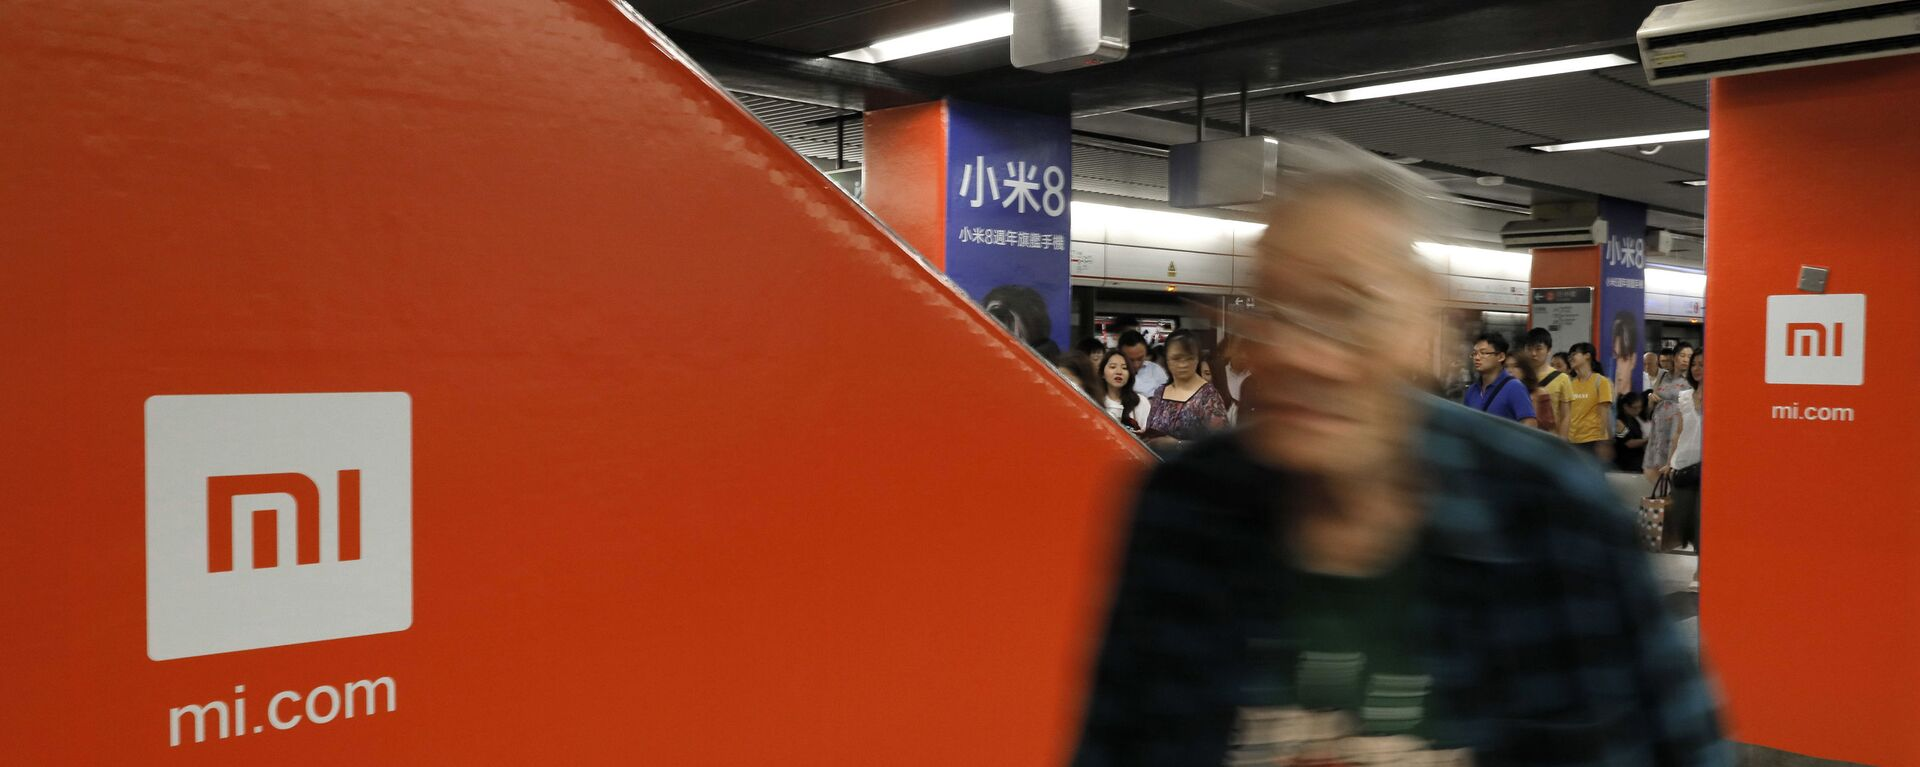 Pubblicità di Xiaomi a Hong Kong - Sputnik Italia, 1920, 30.03.2021